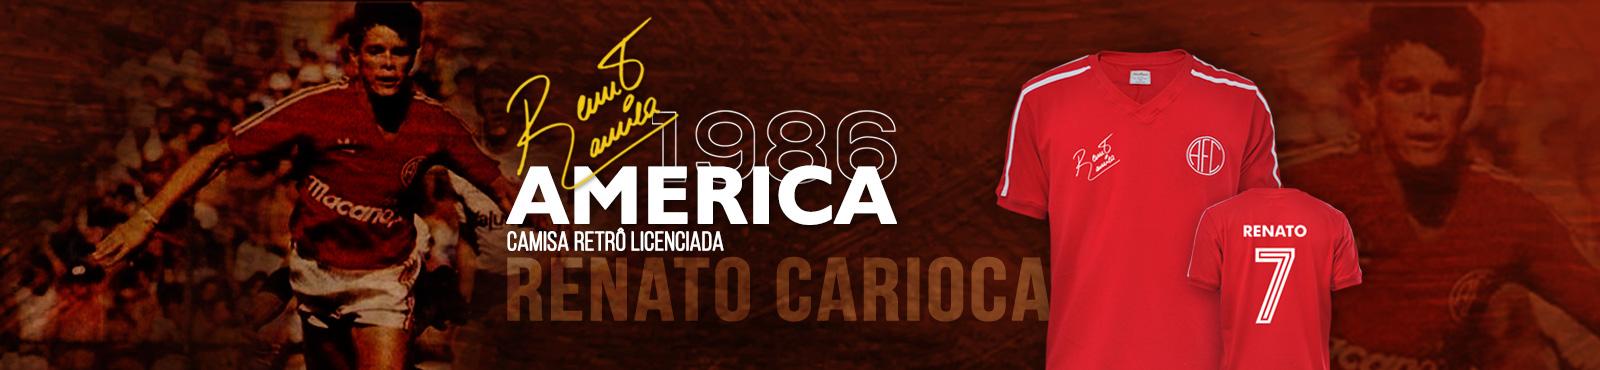 America RJ 1986